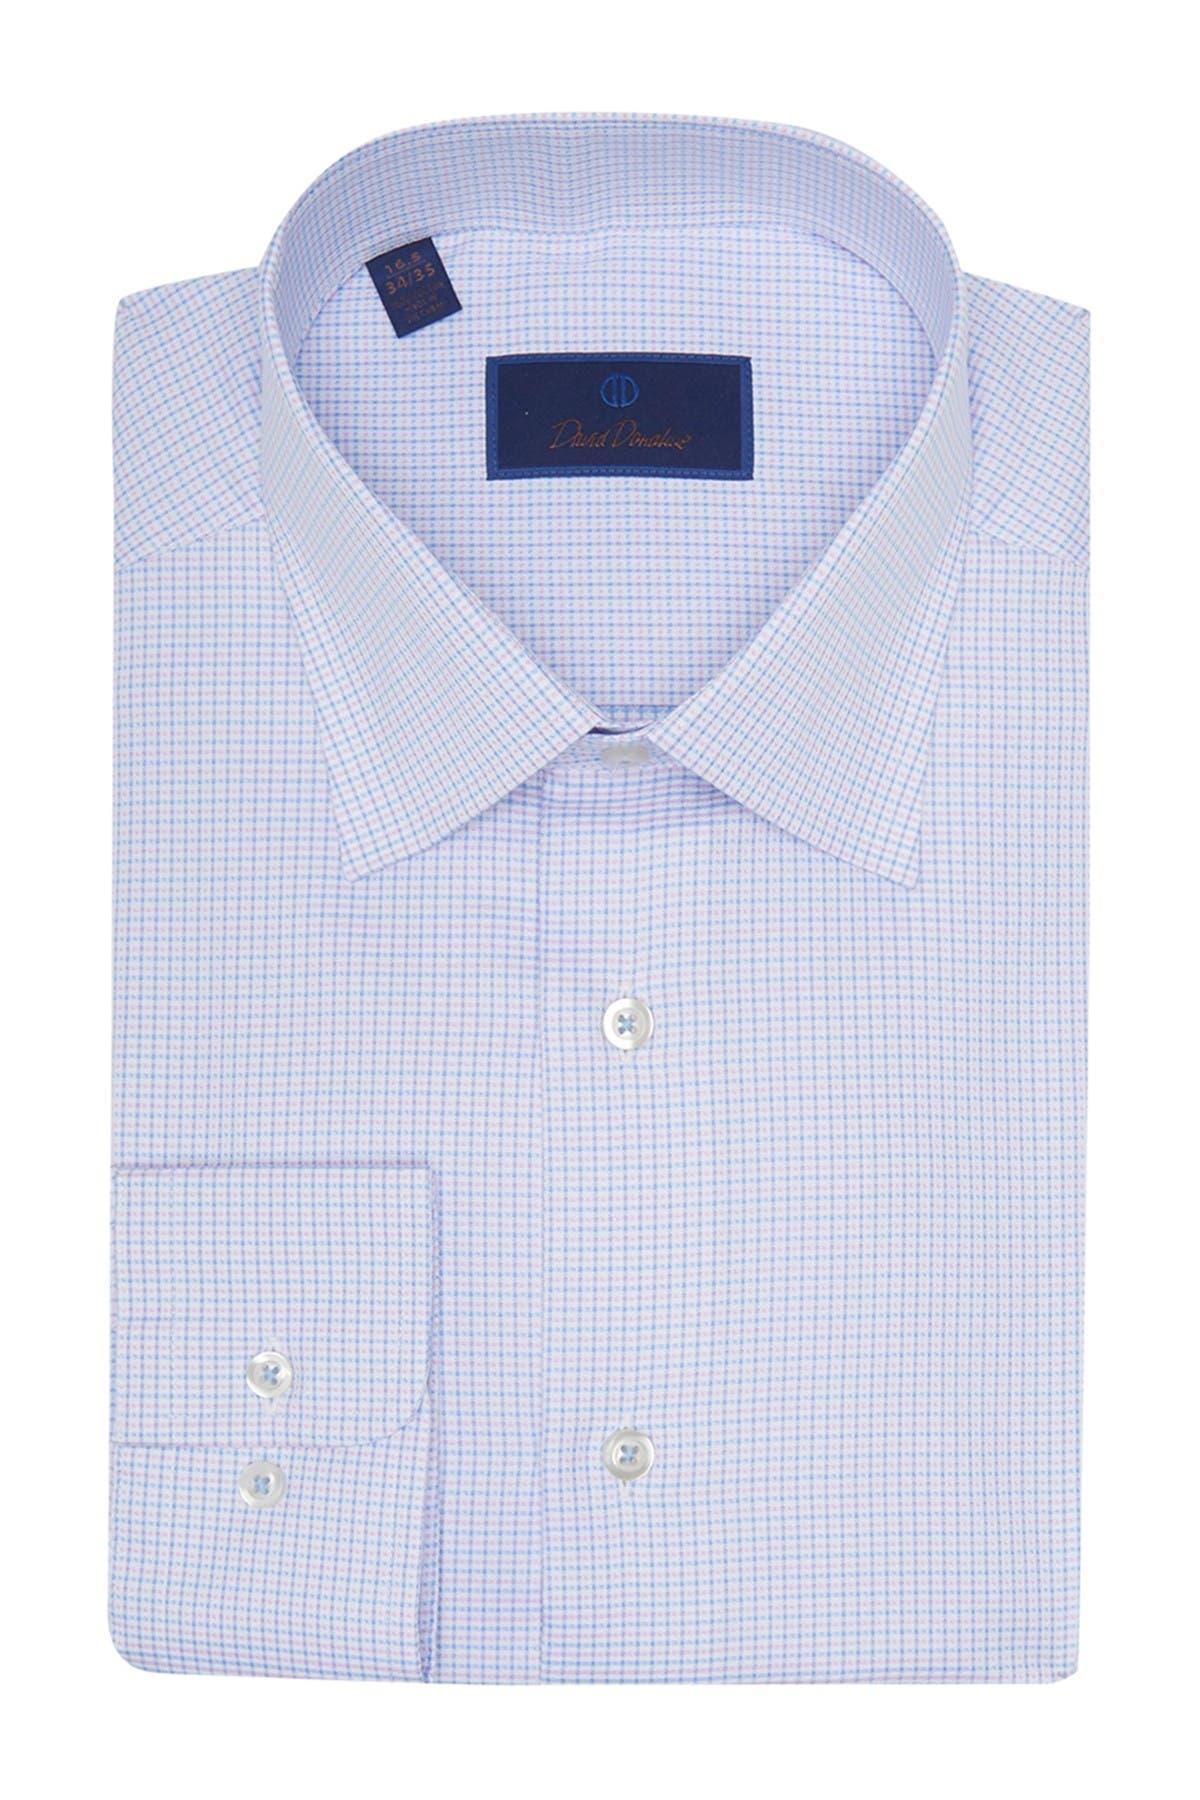 Image of David Donahue Regular Fit Grid Dress Shirt